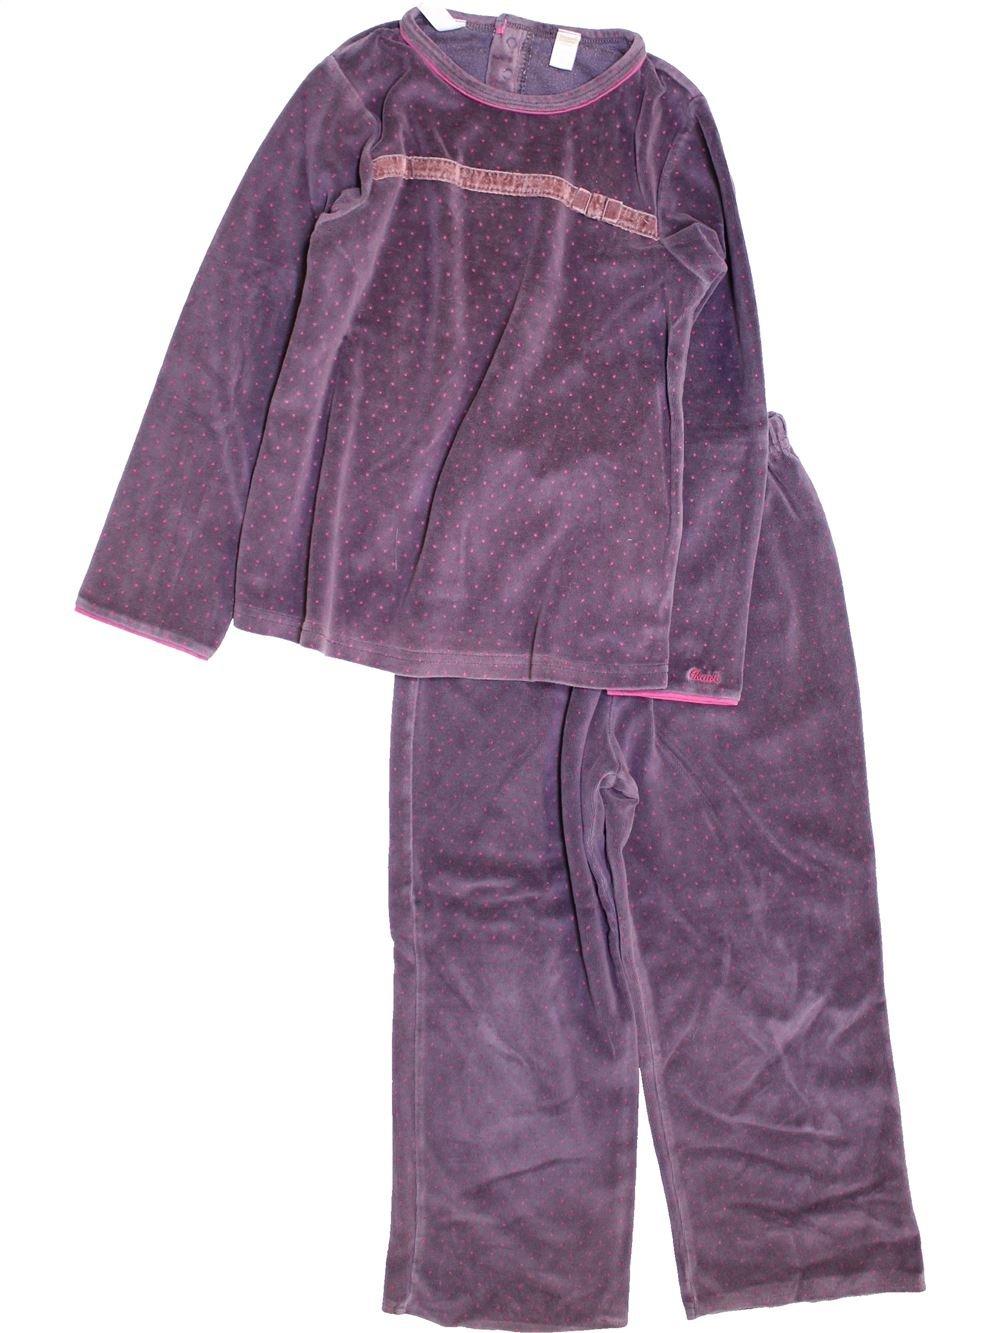 3f0e5f5afc979 Pyjama 2 pièces Fille OKAIDI 8 ans pas cher, 6.25 € - #1447552